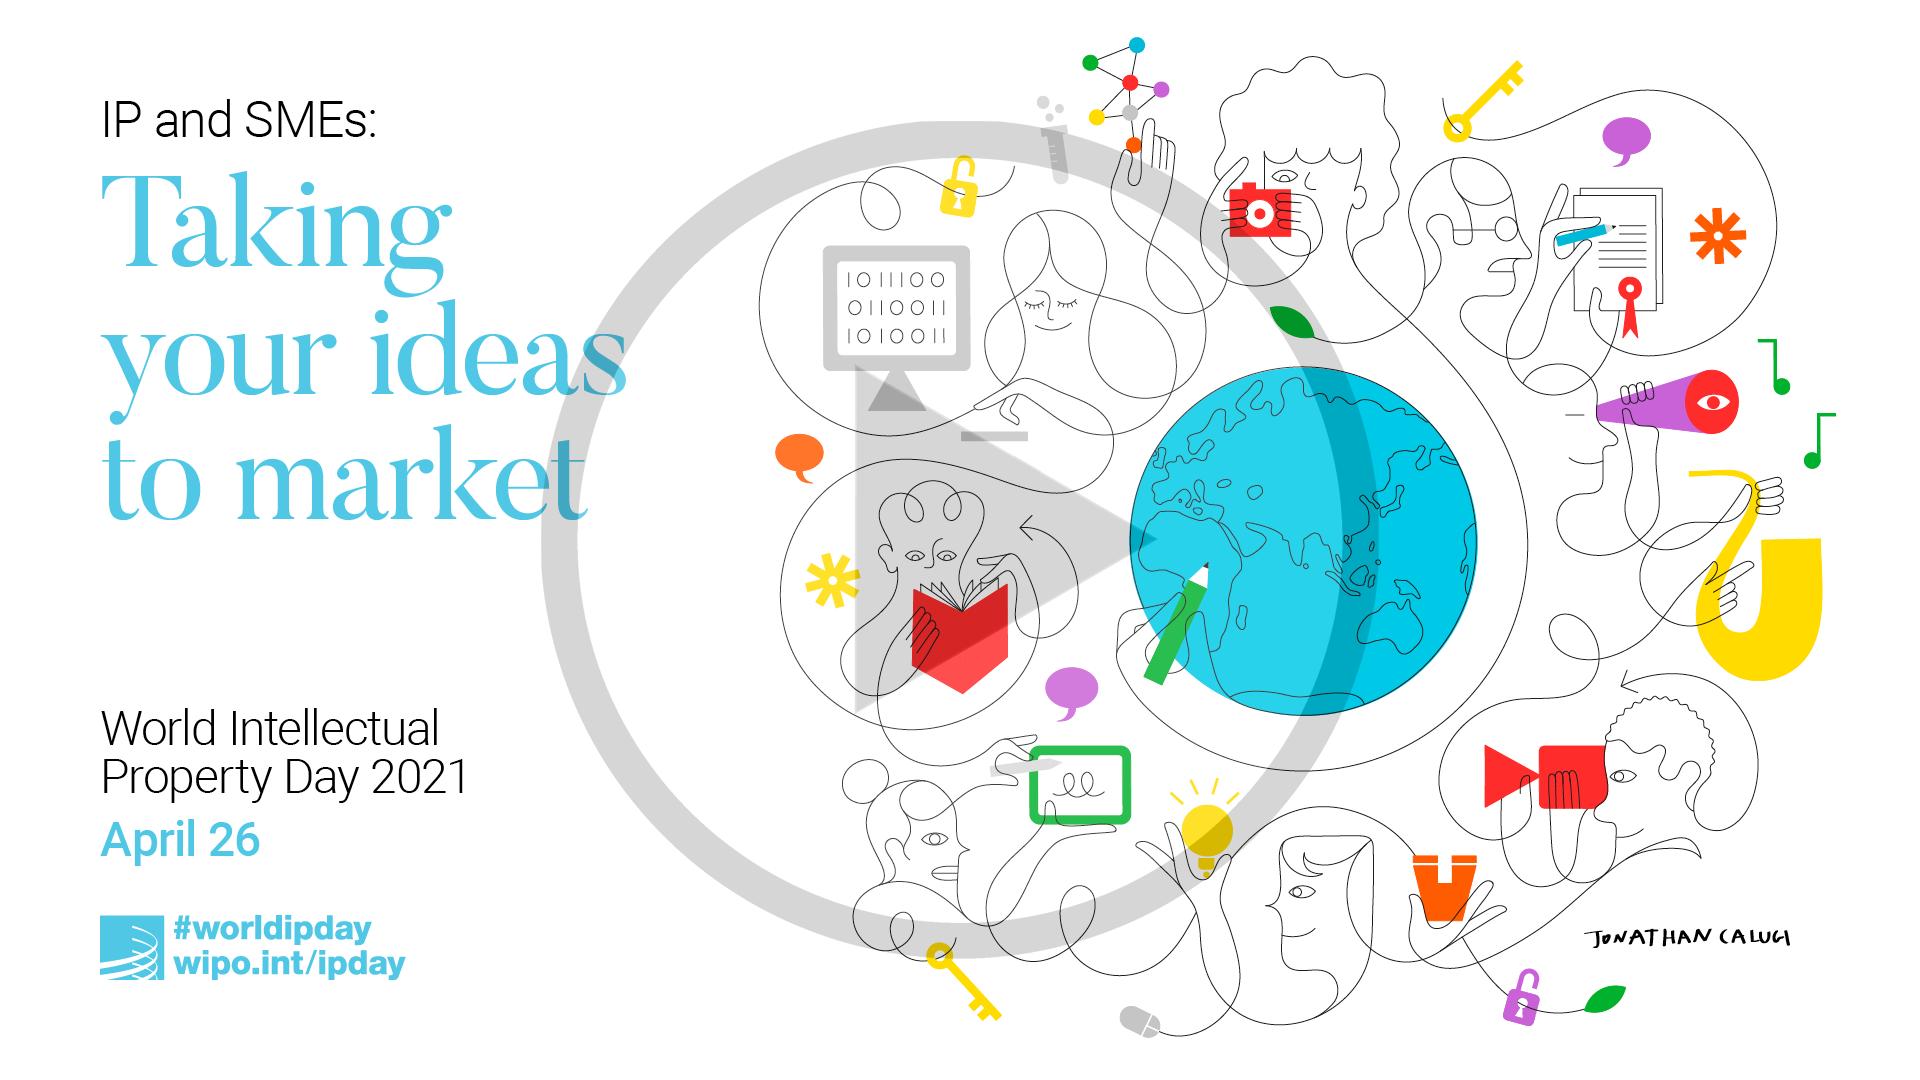 2021 World Intellectual Property Day